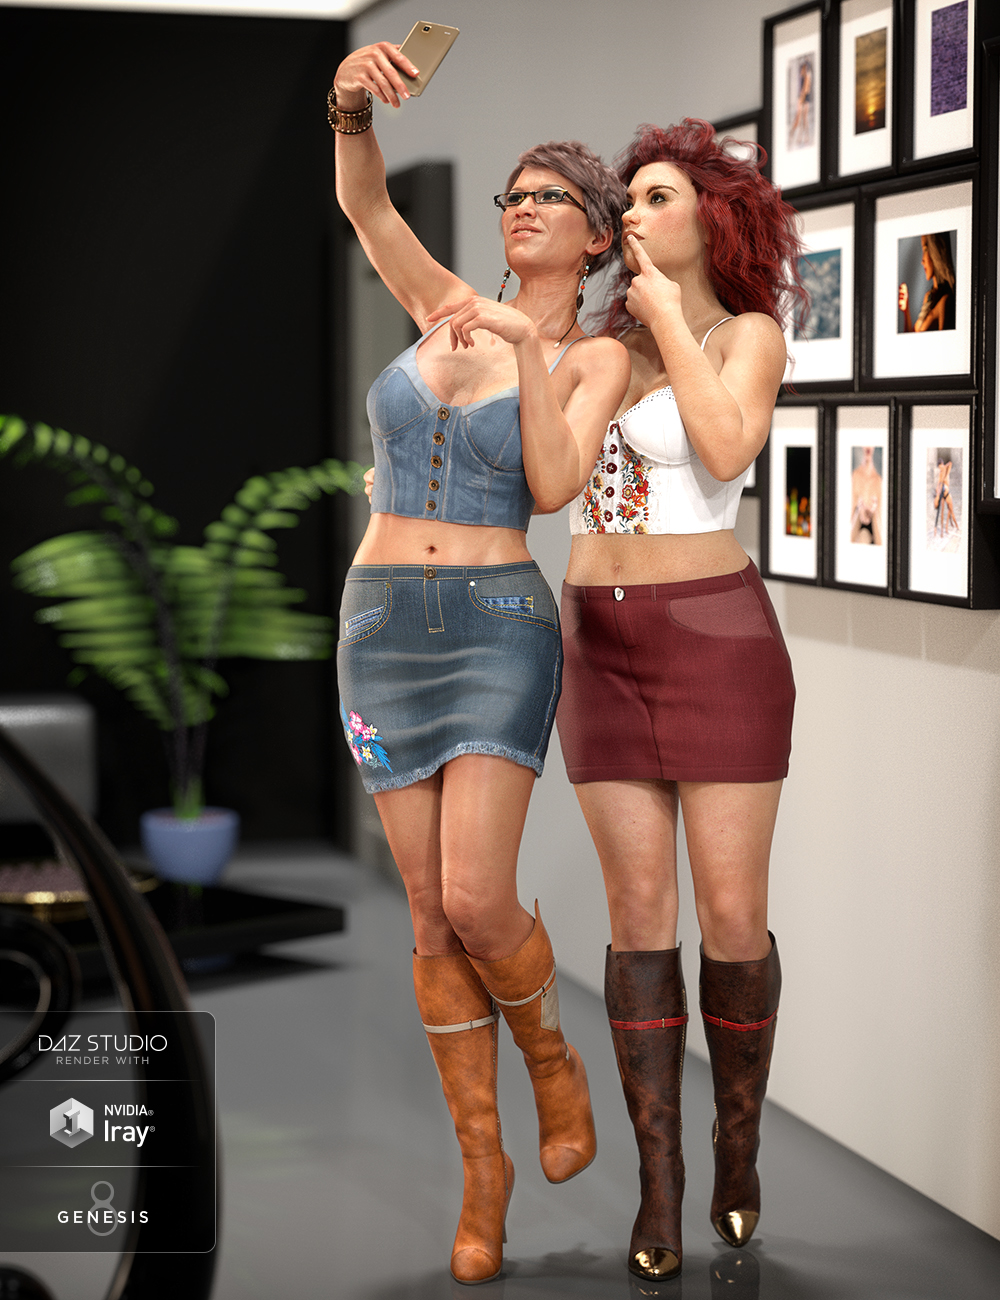 Sydney Denim Outfit Textures by: Moonscape GraphicsSade, 3D Models by Daz 3D